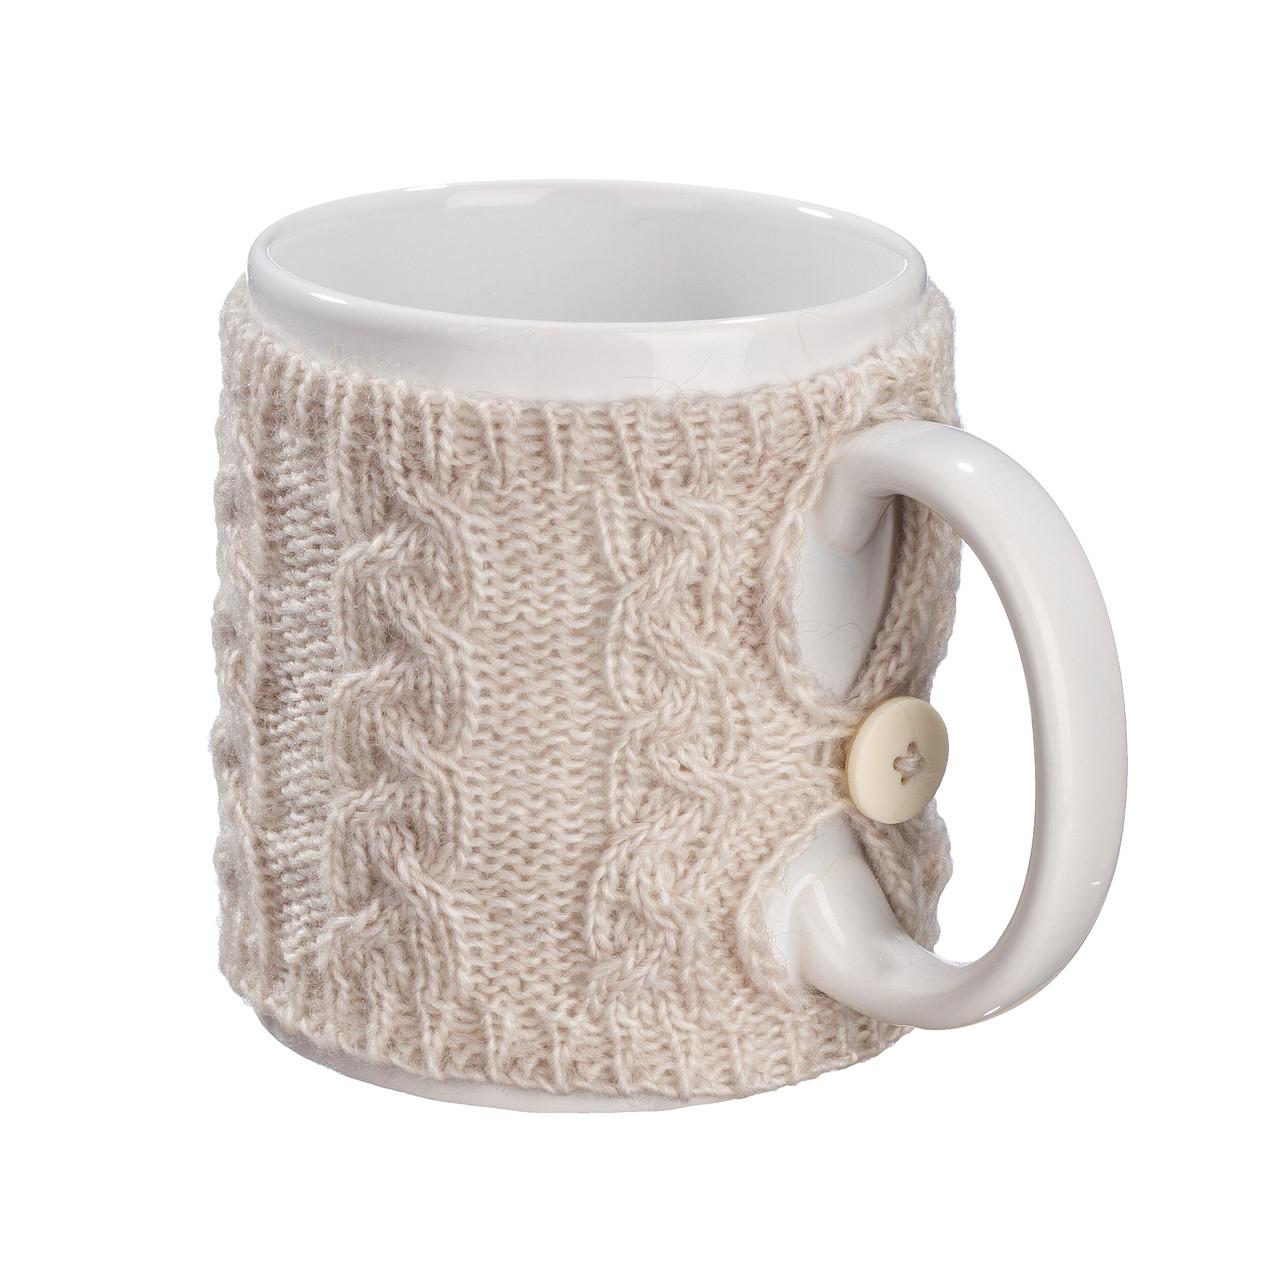 Вязаный чехол для чашки Ohaina цвет какао